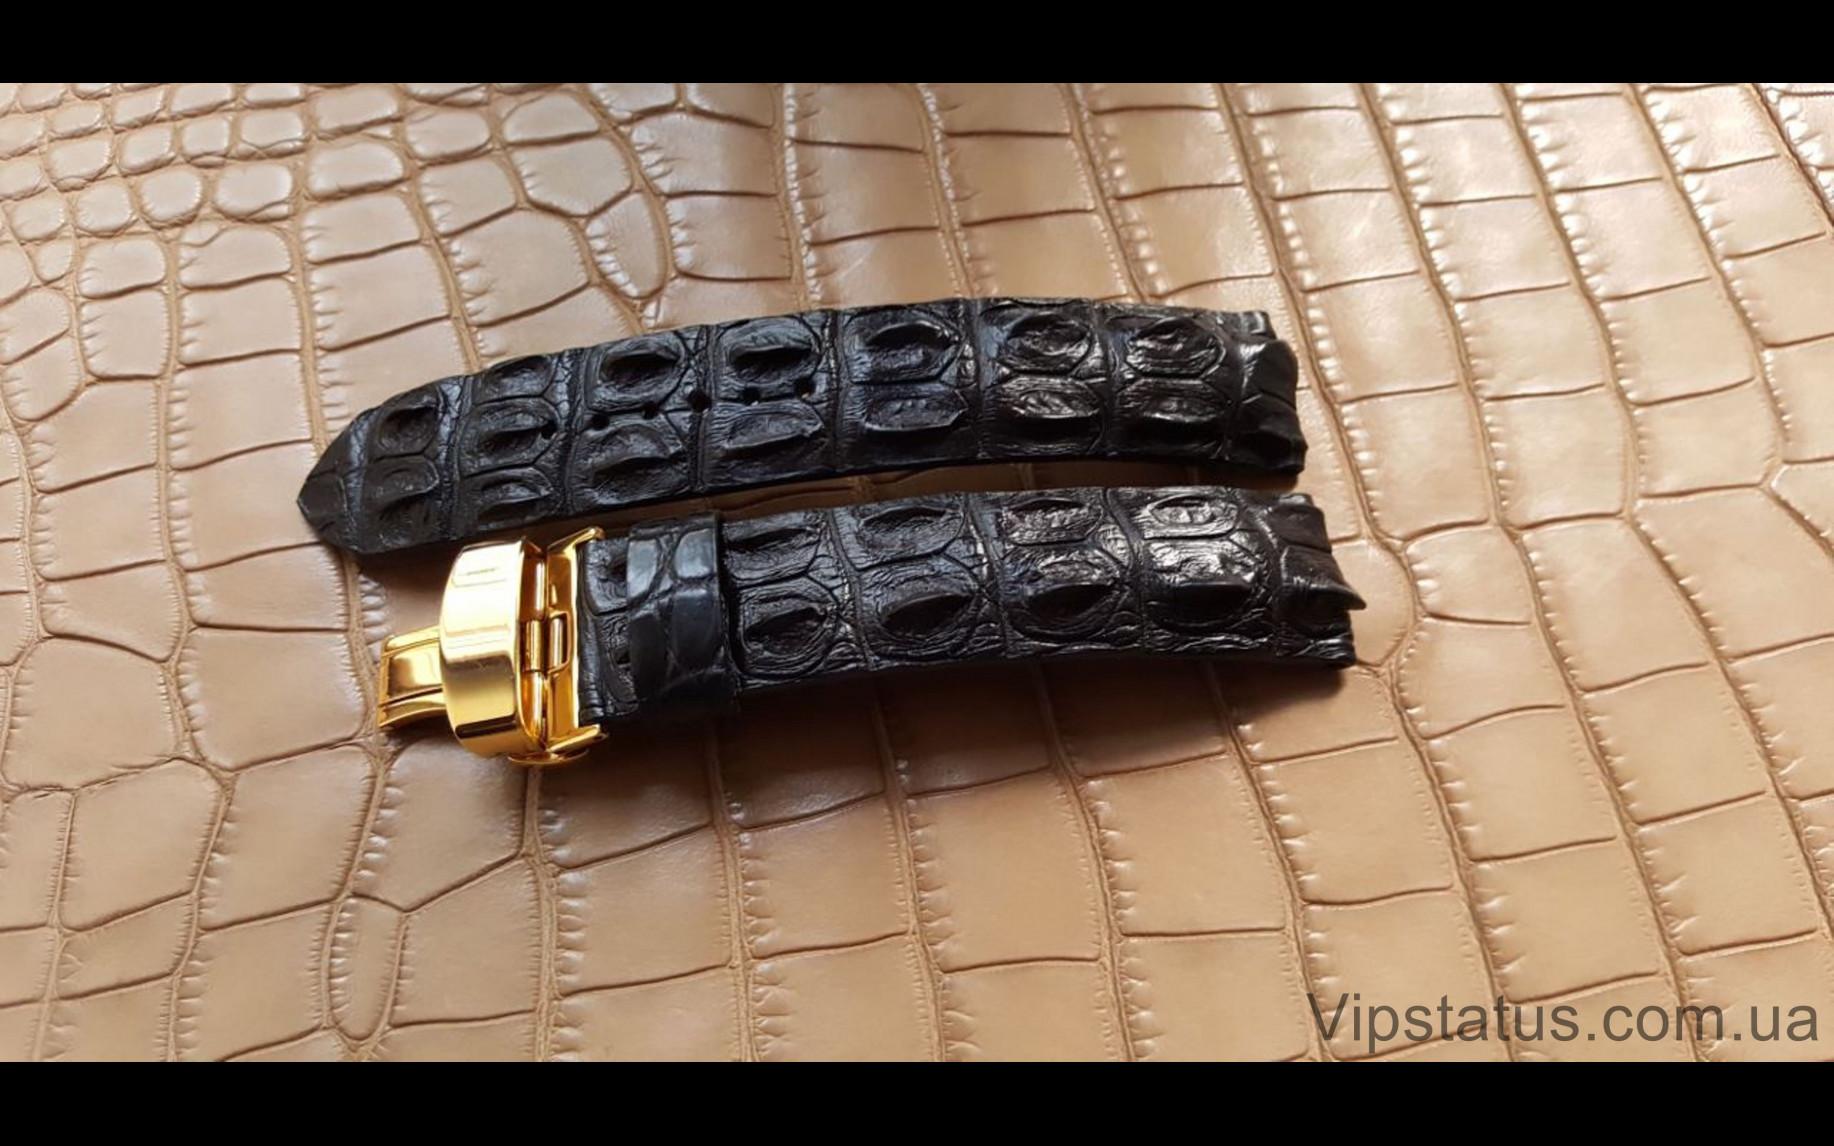 Elite Эксклюзивный ремешок для часов Carl F. Bucherer кожа крокодила Exclusive Crocodile Strap for Carl F. Bucherer watches image 3